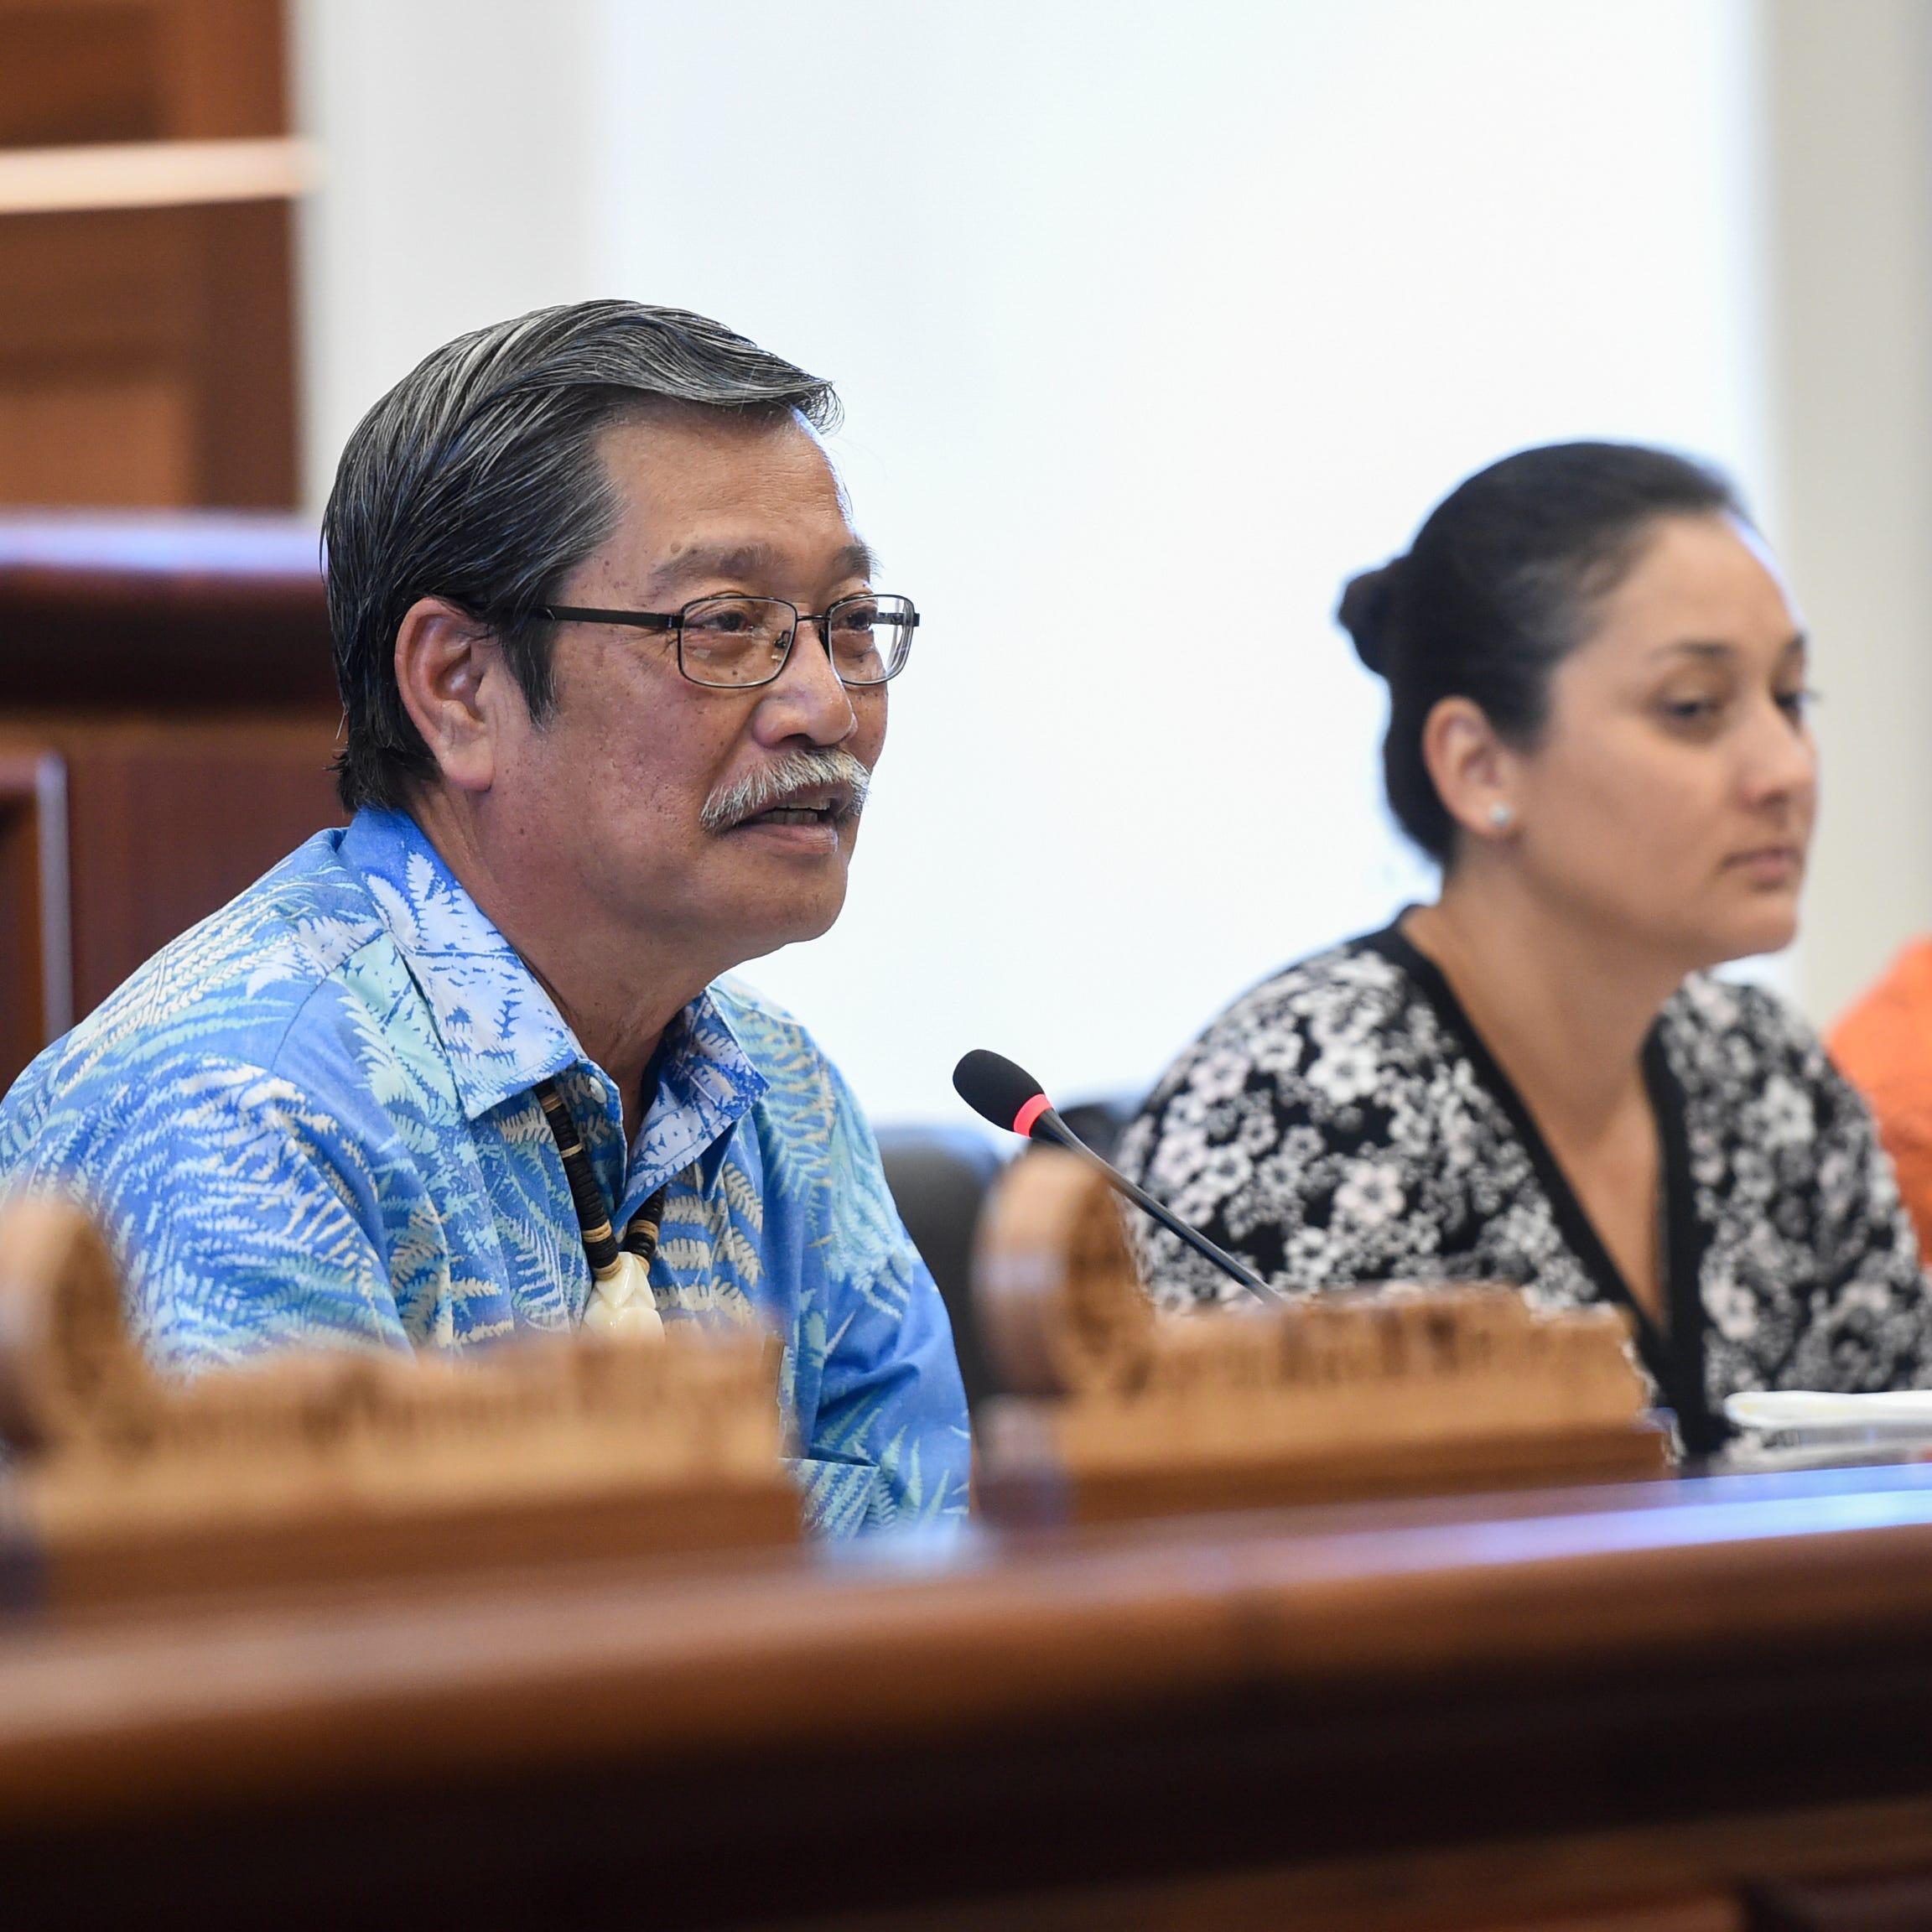 Sen. Joe San Agustin asks for input on raising minimum wage to $9.25